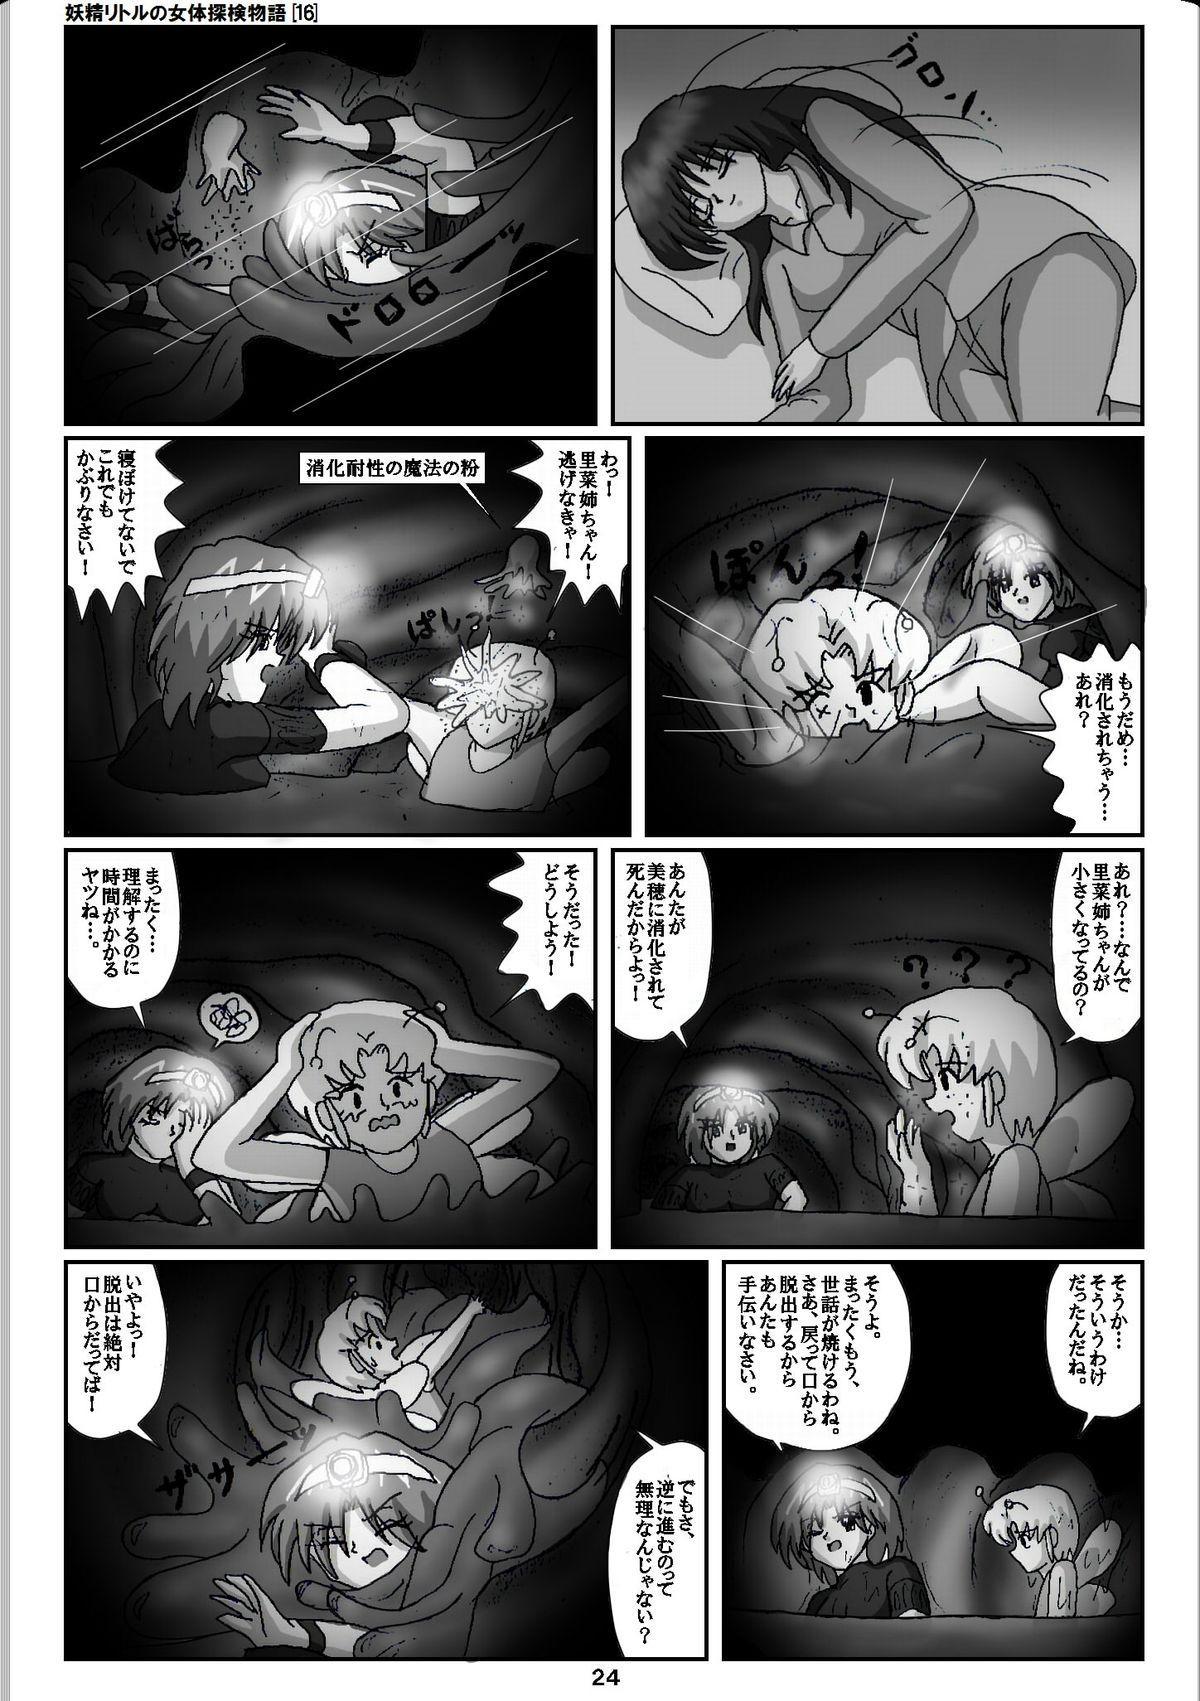 Yousei Little no Nyotai Tanken Monogatari 23